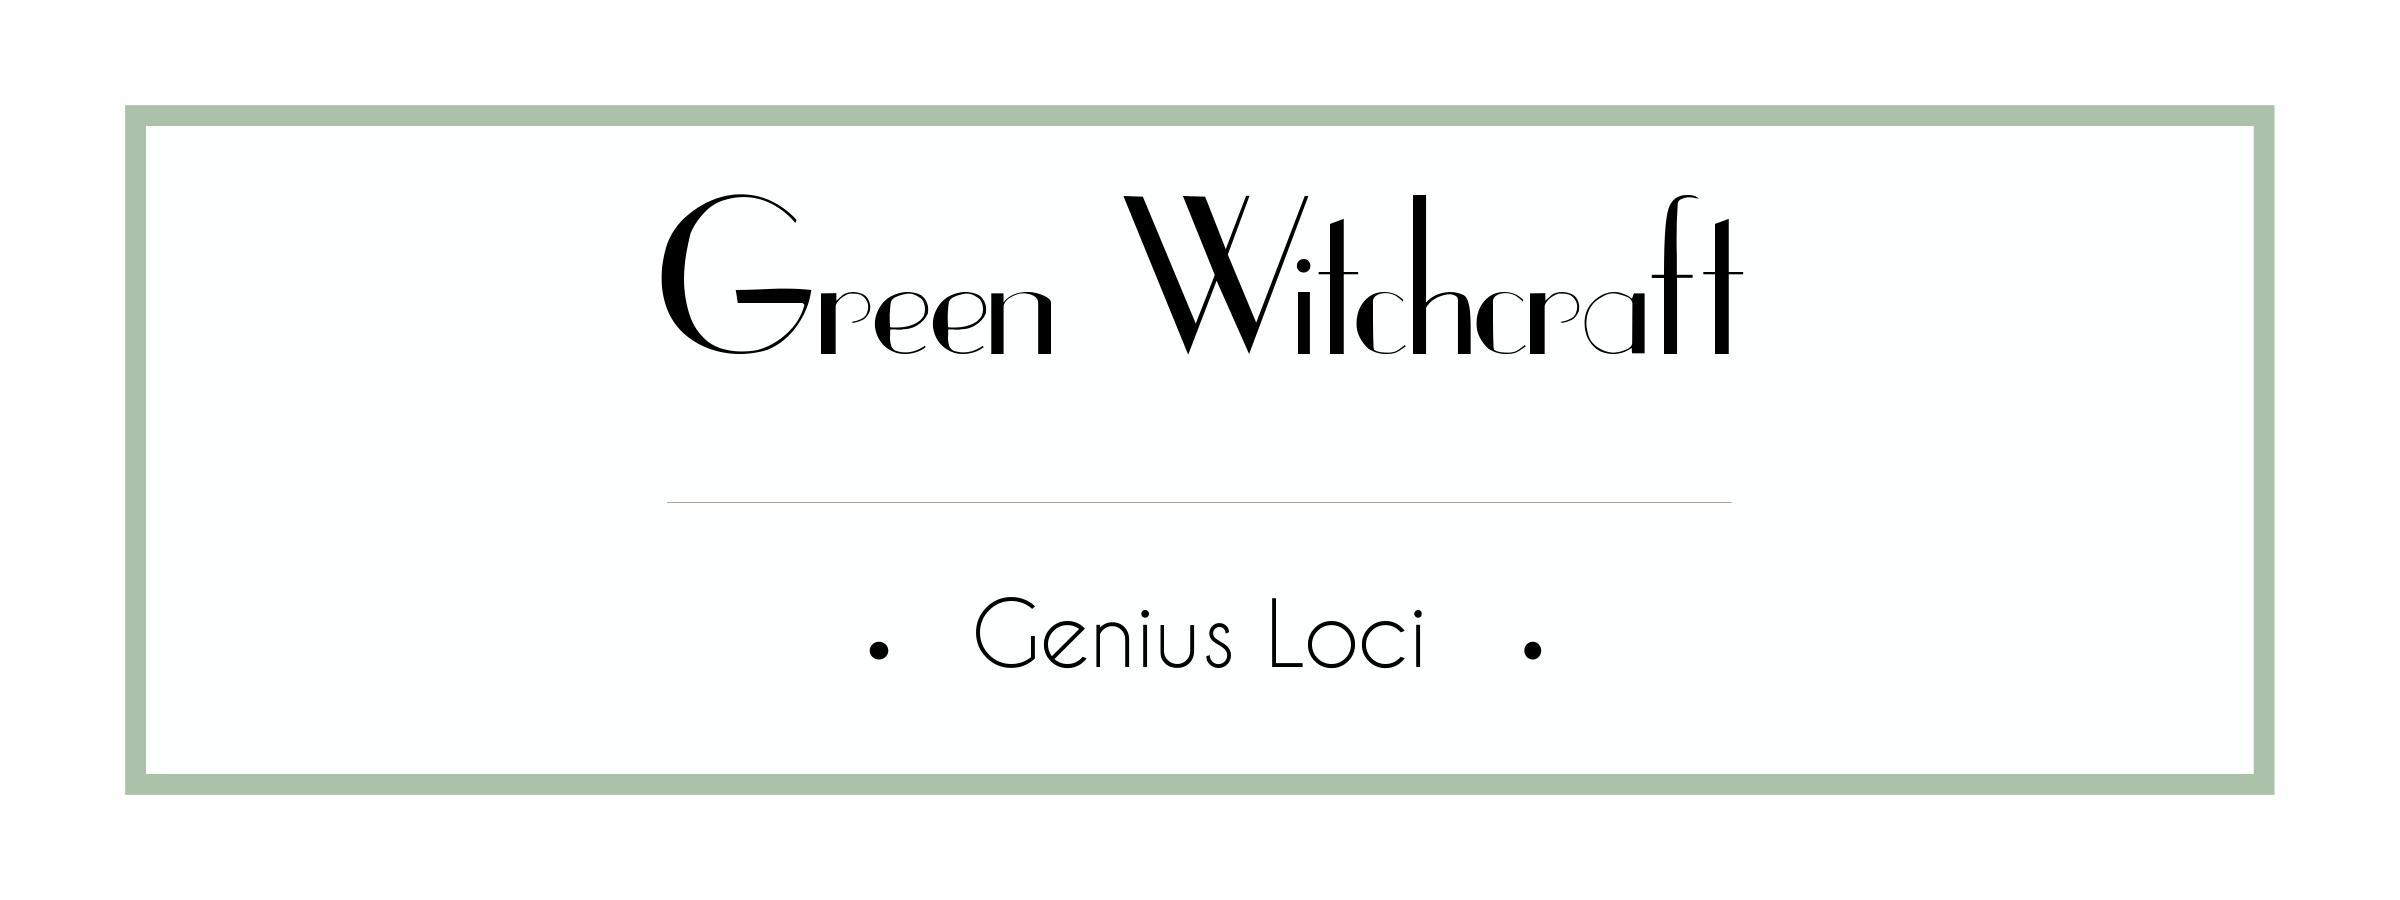 Green Witchcraft Course - Genius Loci